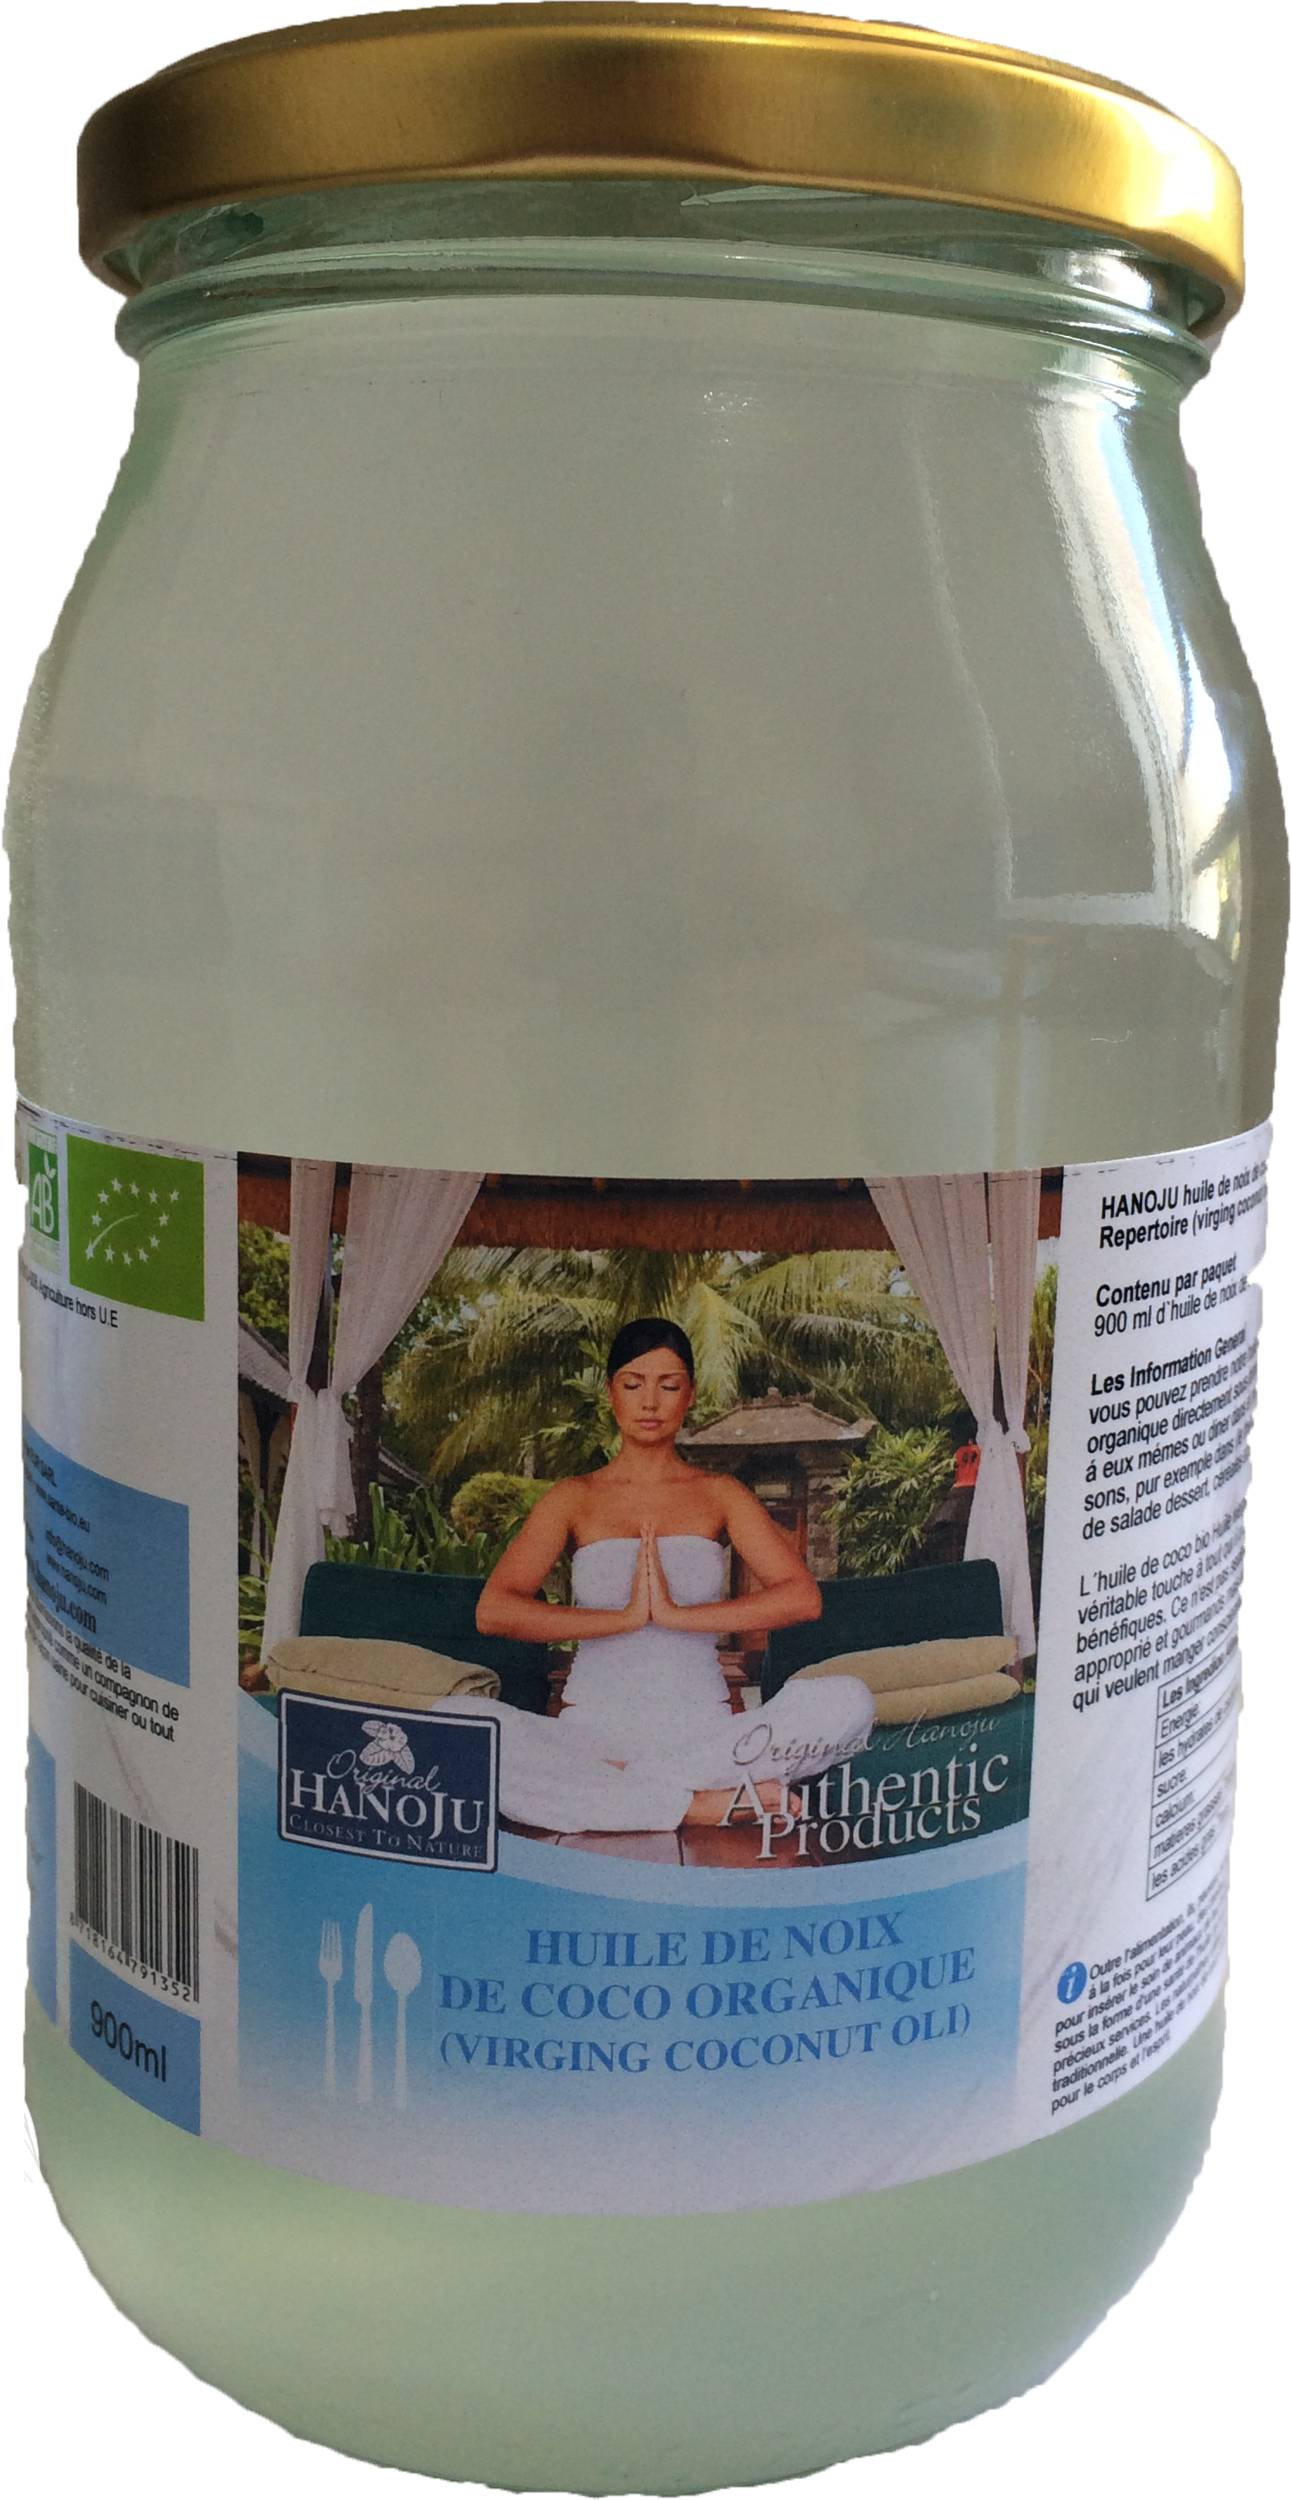 Hanoju Huile de Noix de Coco Vierge Biologique - 500 ml